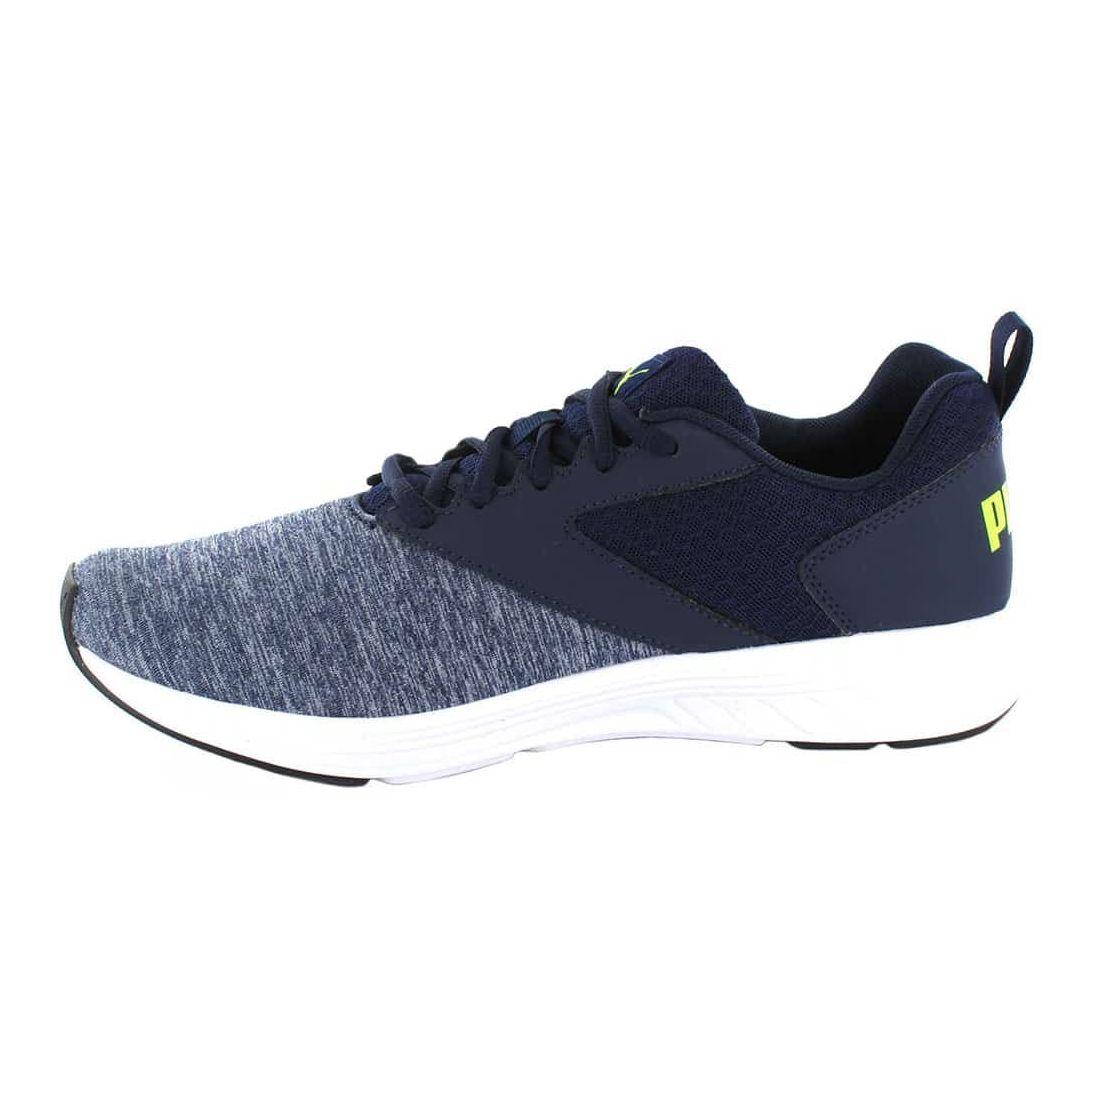 Puma NRGY Comet Blue - Running Man Sneakers